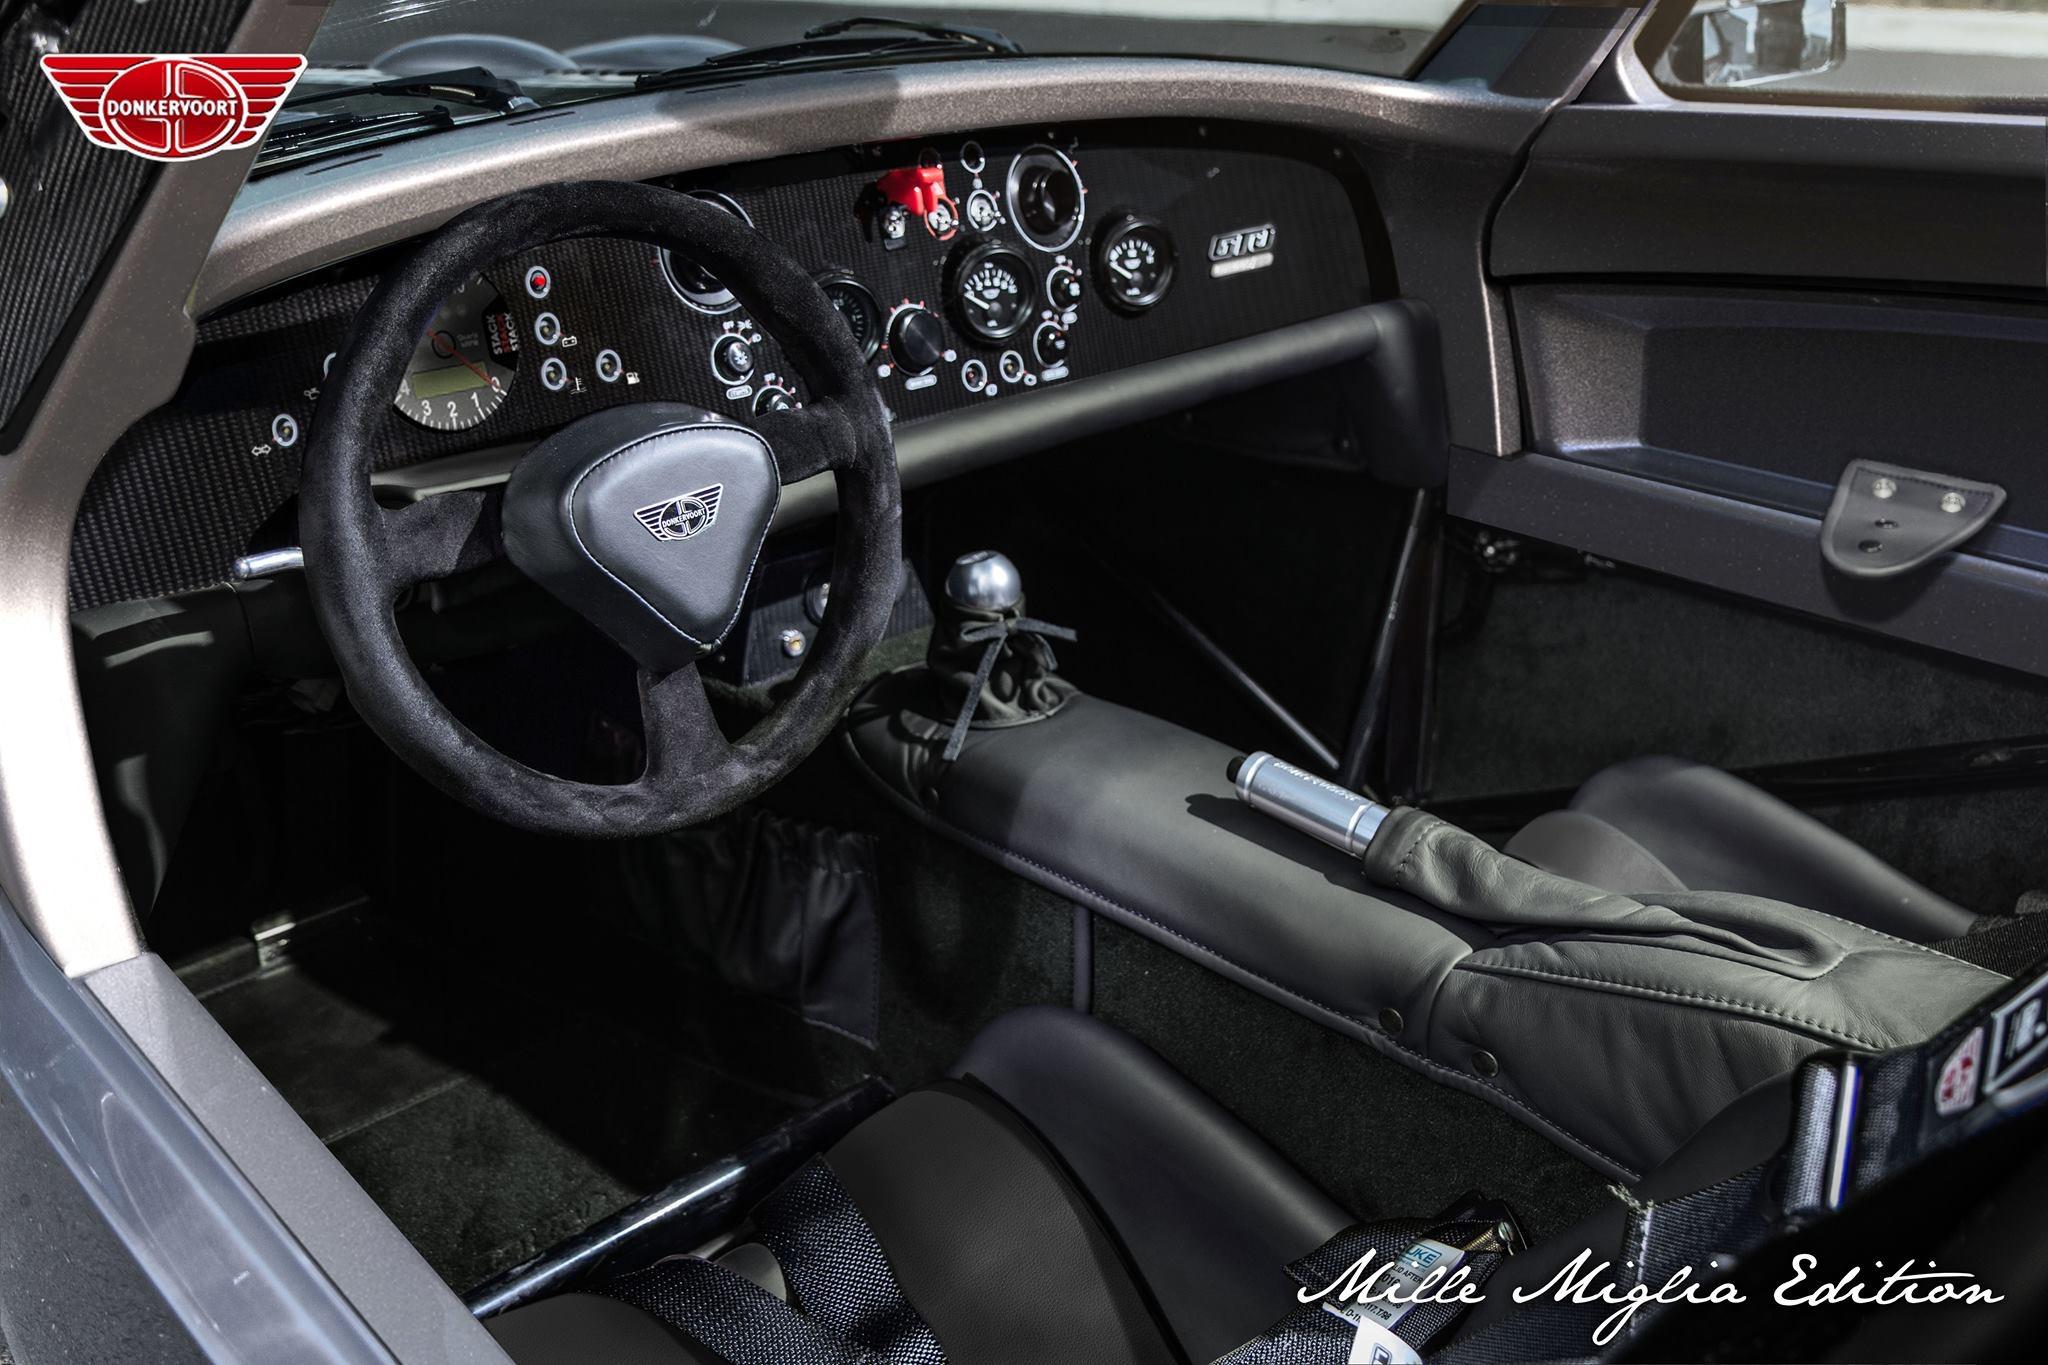 Donkervoort D8 Gto 1000 Miglia Edition Donkiespeed Nl